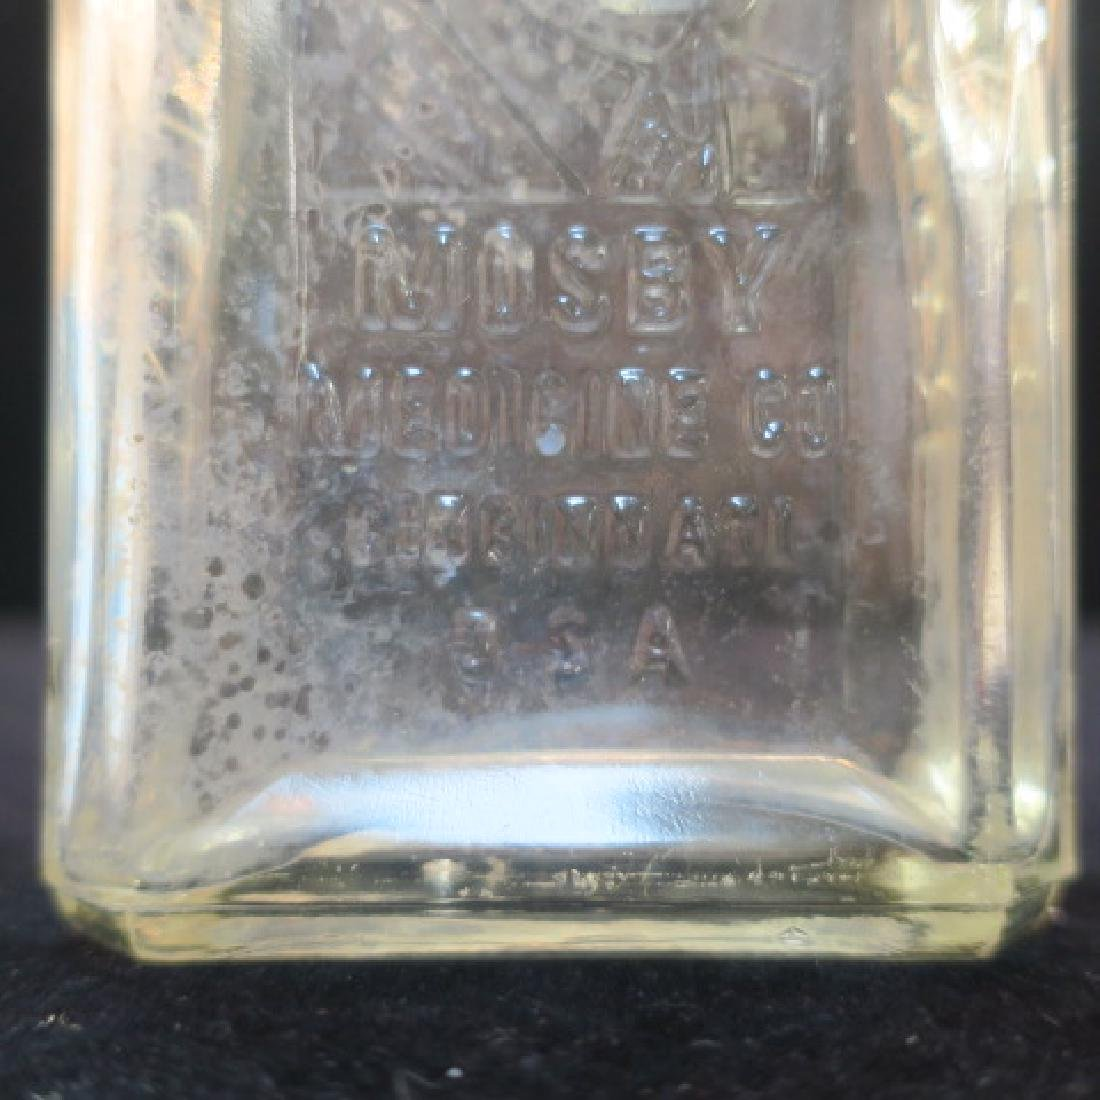 KONJOLA Patent Medicine Bottle, CA 1929: - 2